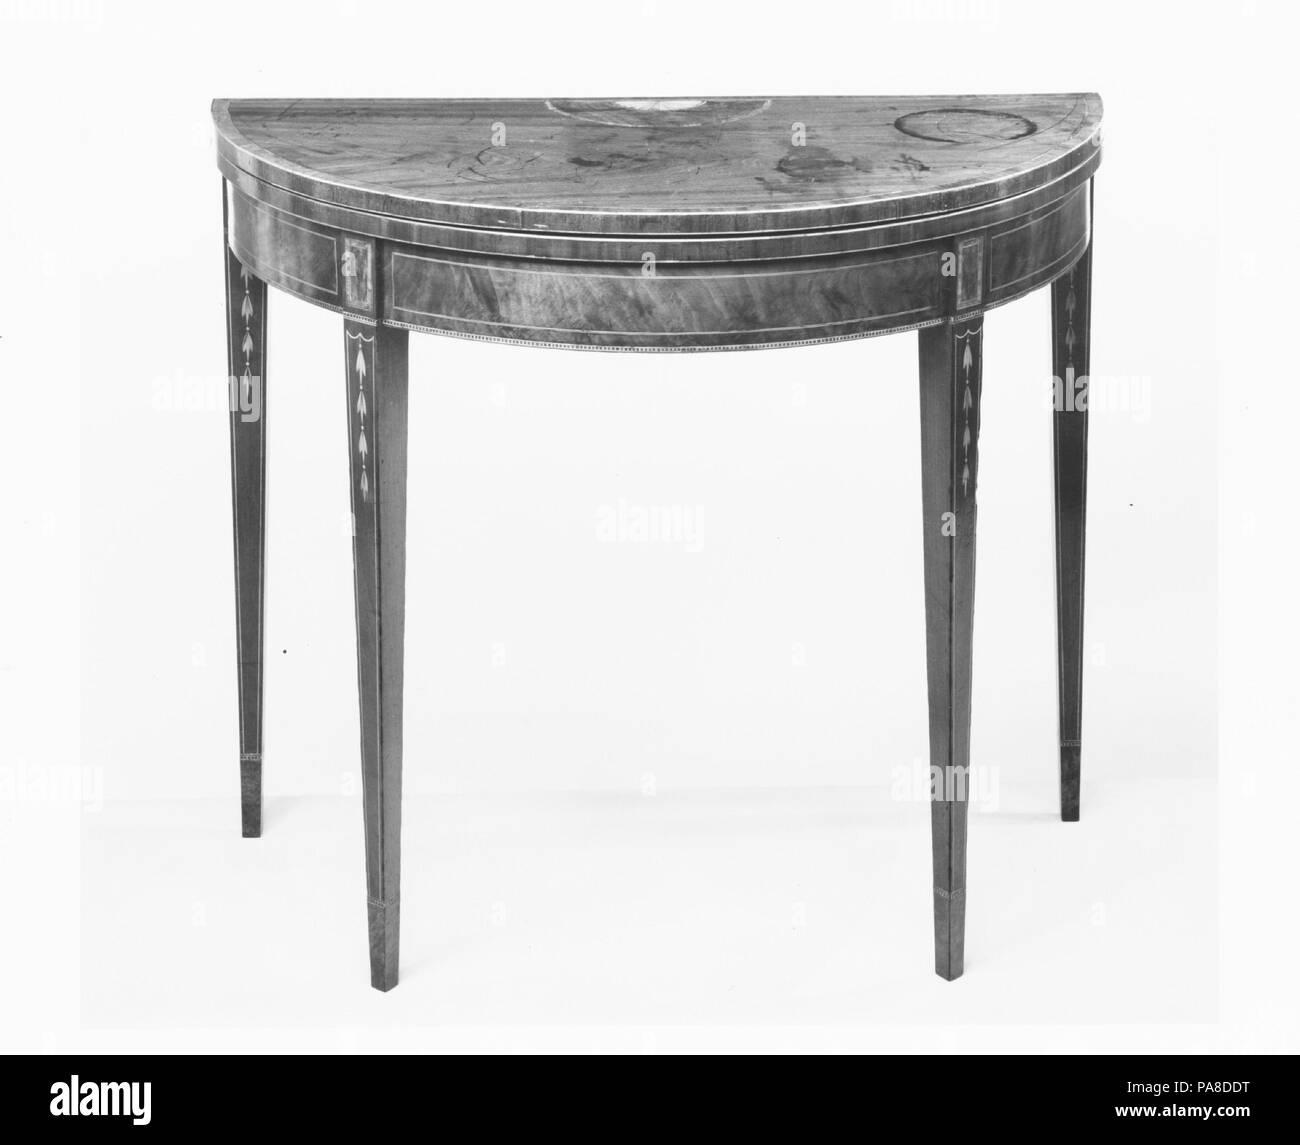 Superbe Card Table. Culture: American. Dimensions: 30 X 35 In. (76.2 X 88.9 Cm).  Date: 1790 1805. Museum: Metropolitan Museum Of Art, New York, USA.